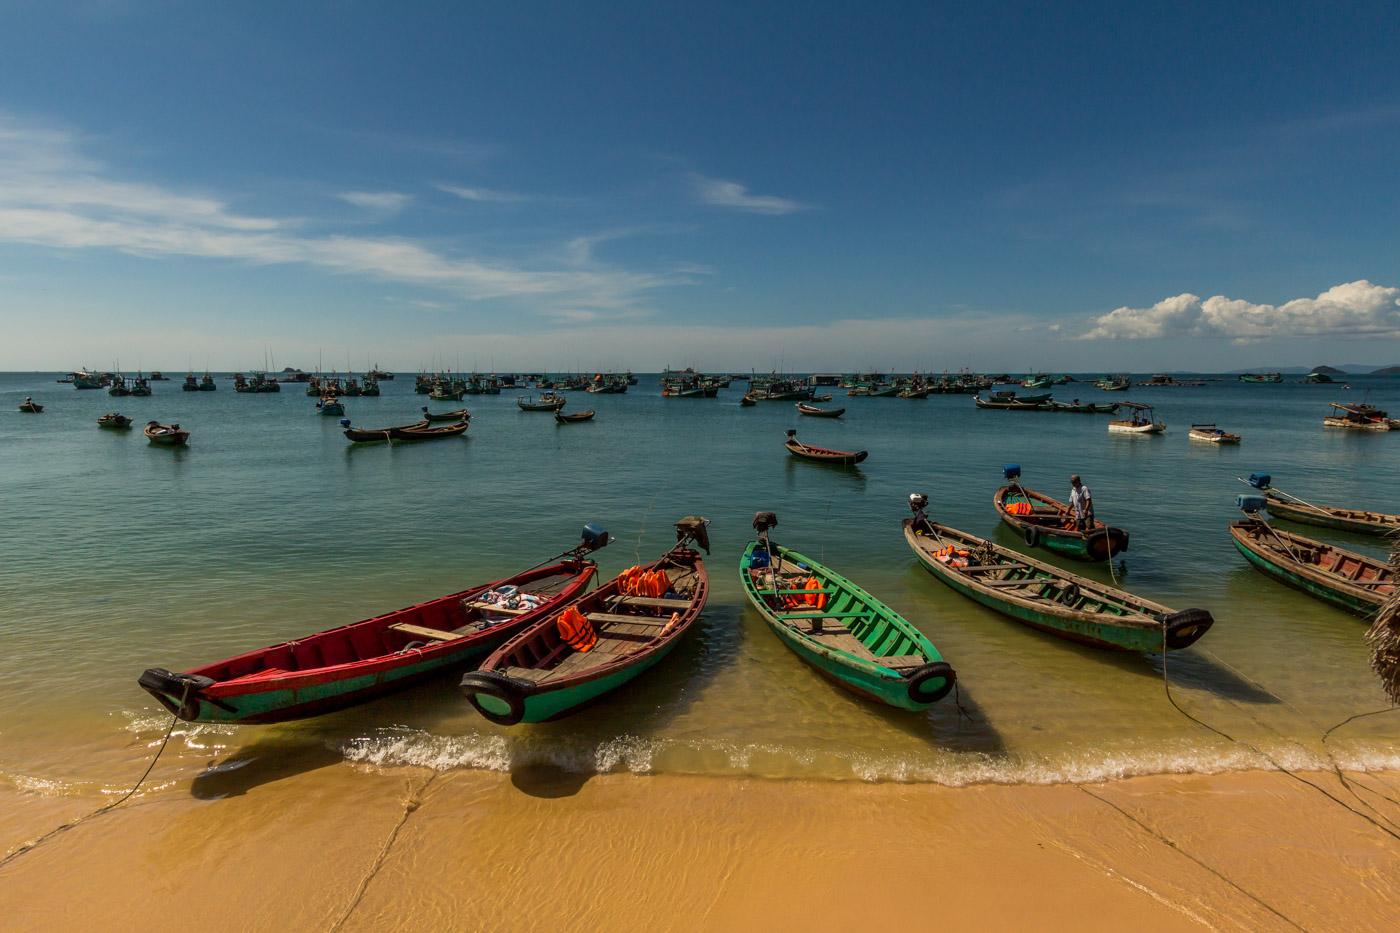 This fishing fleet.